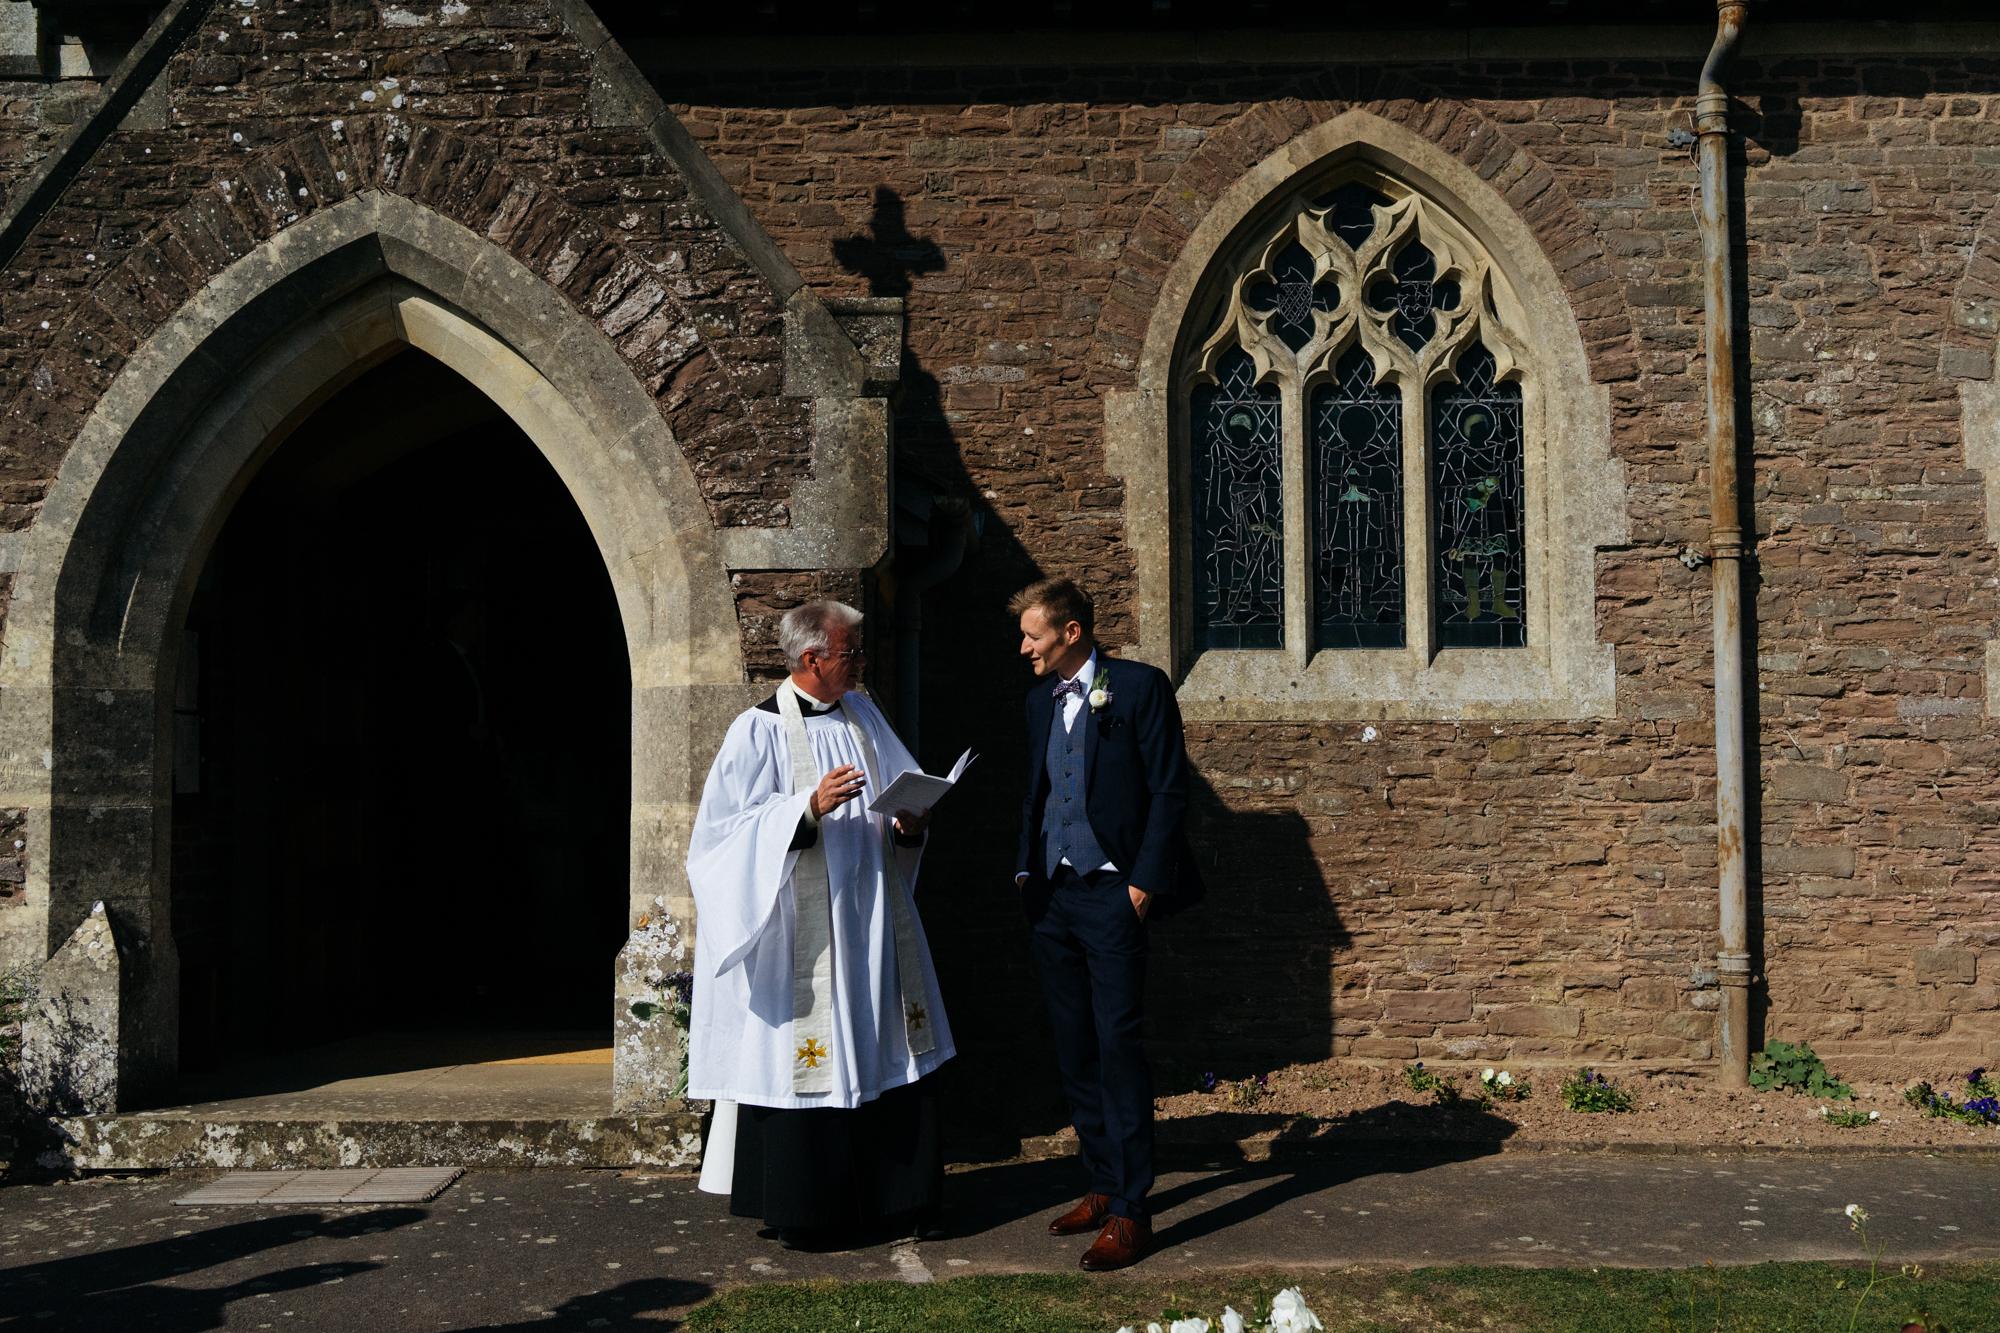 Vicar and Groom